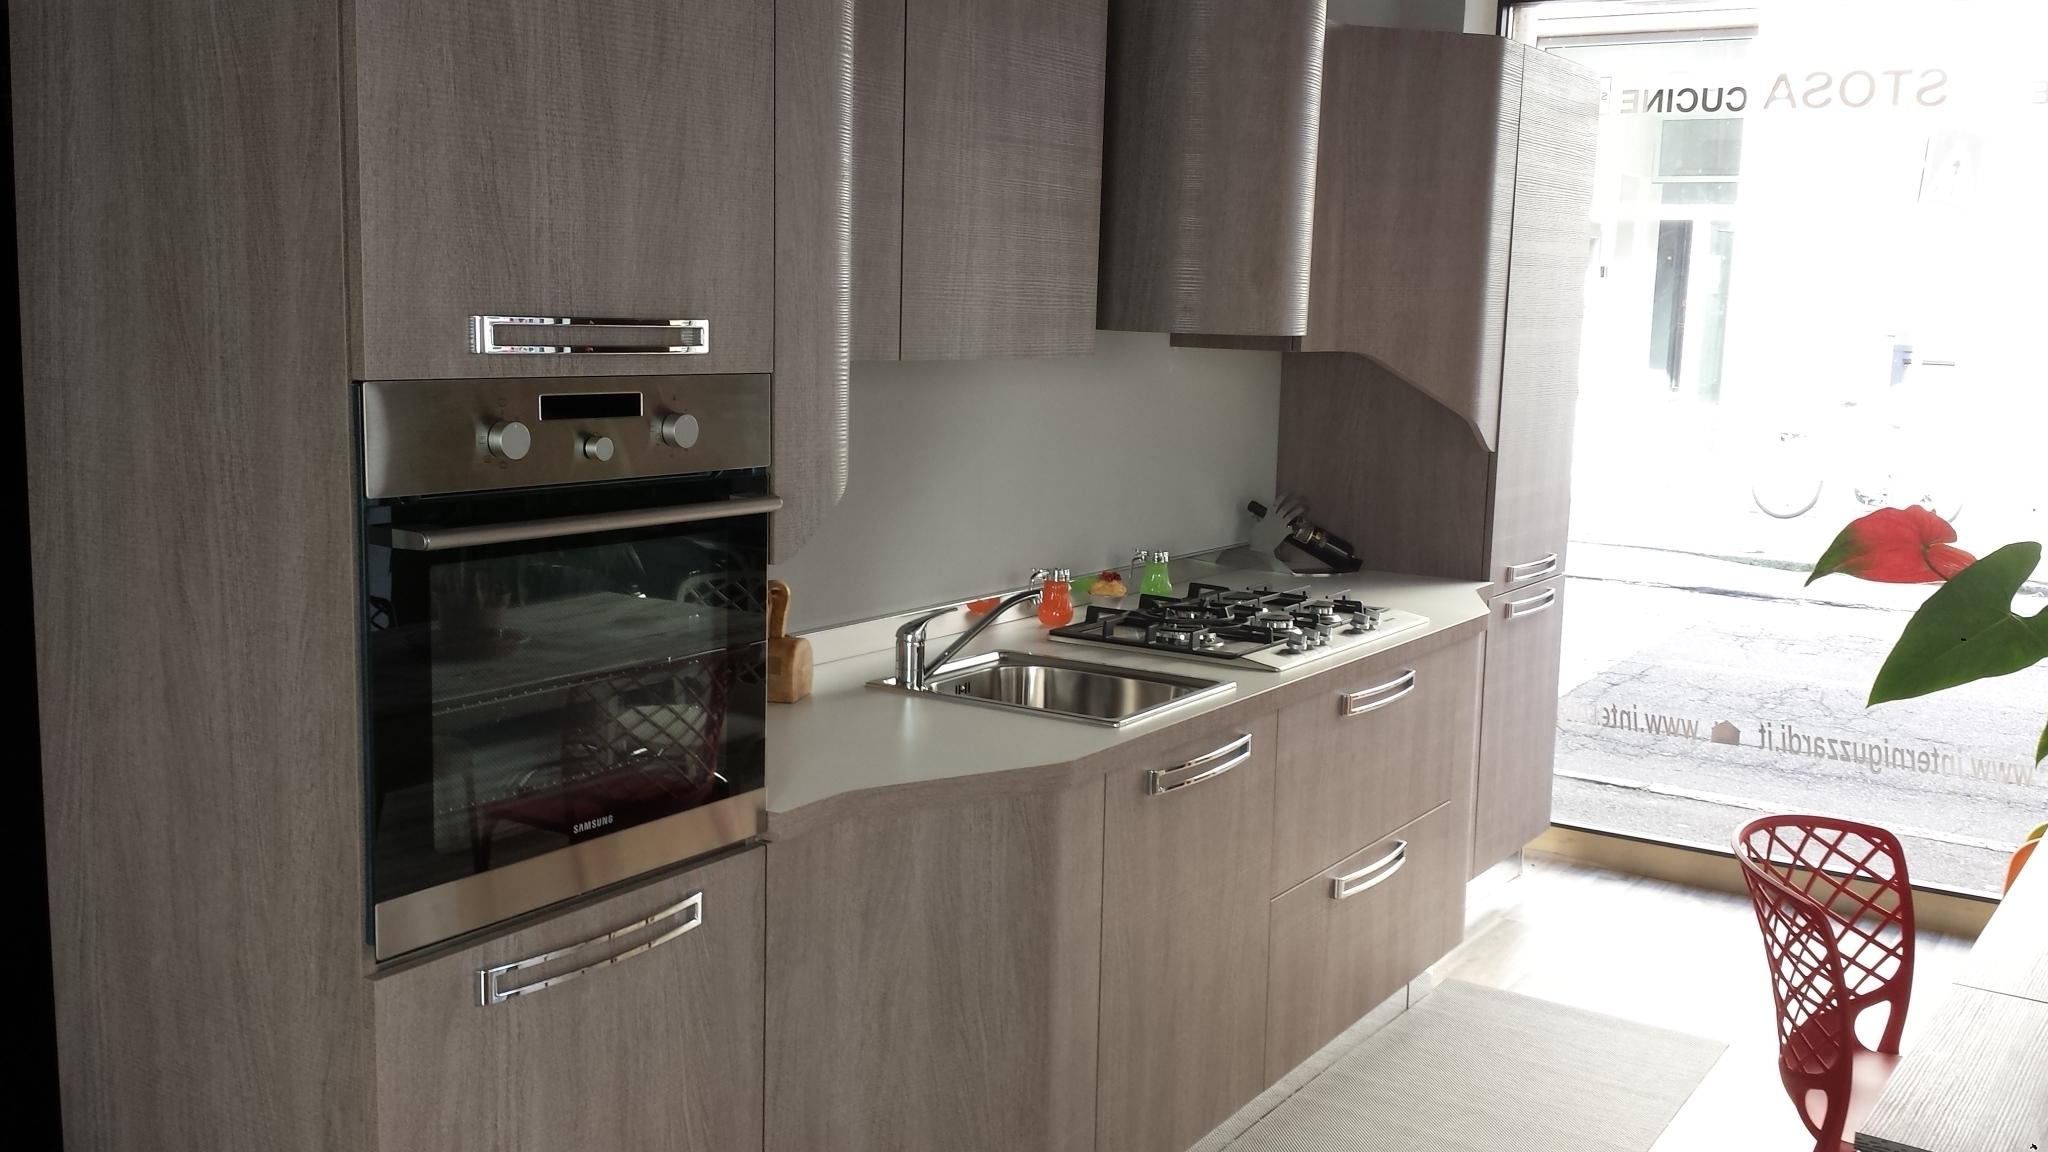 Cucina stosa milly in promozione cucine a prezzi scontati - Altezza cucina stosa ...